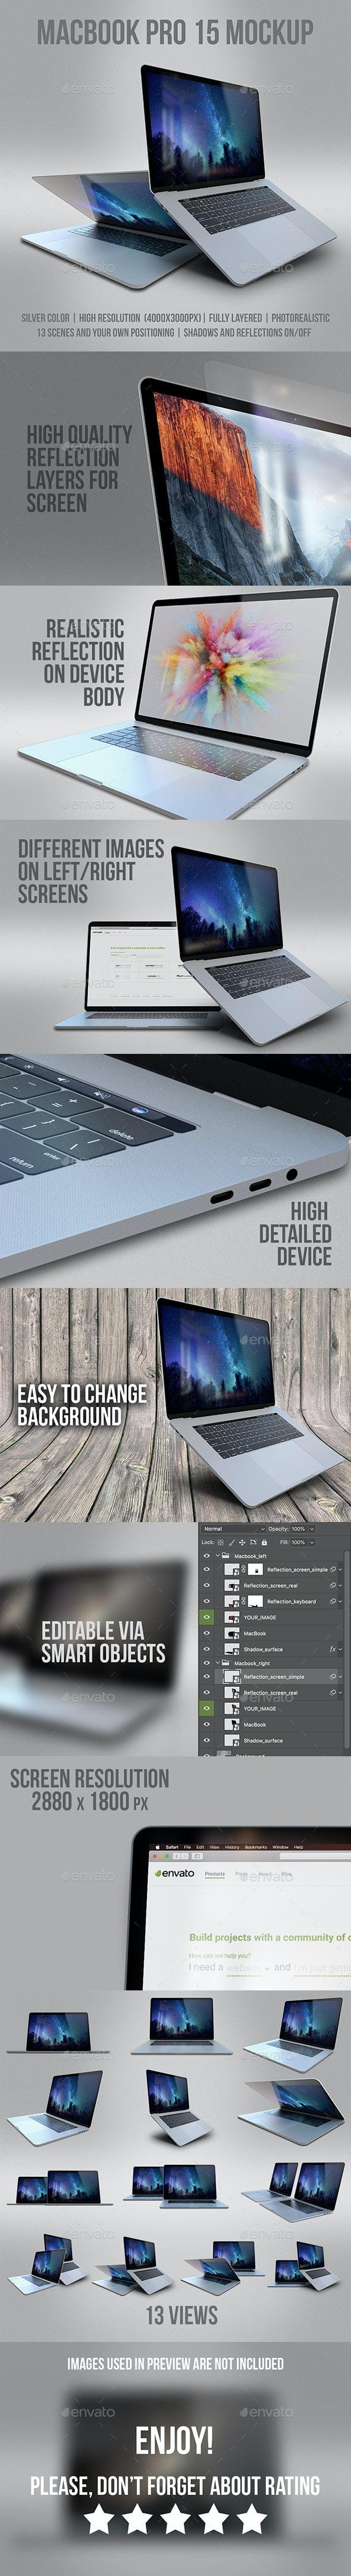 MacBook Pro 15 Mockup - Laptop Displays